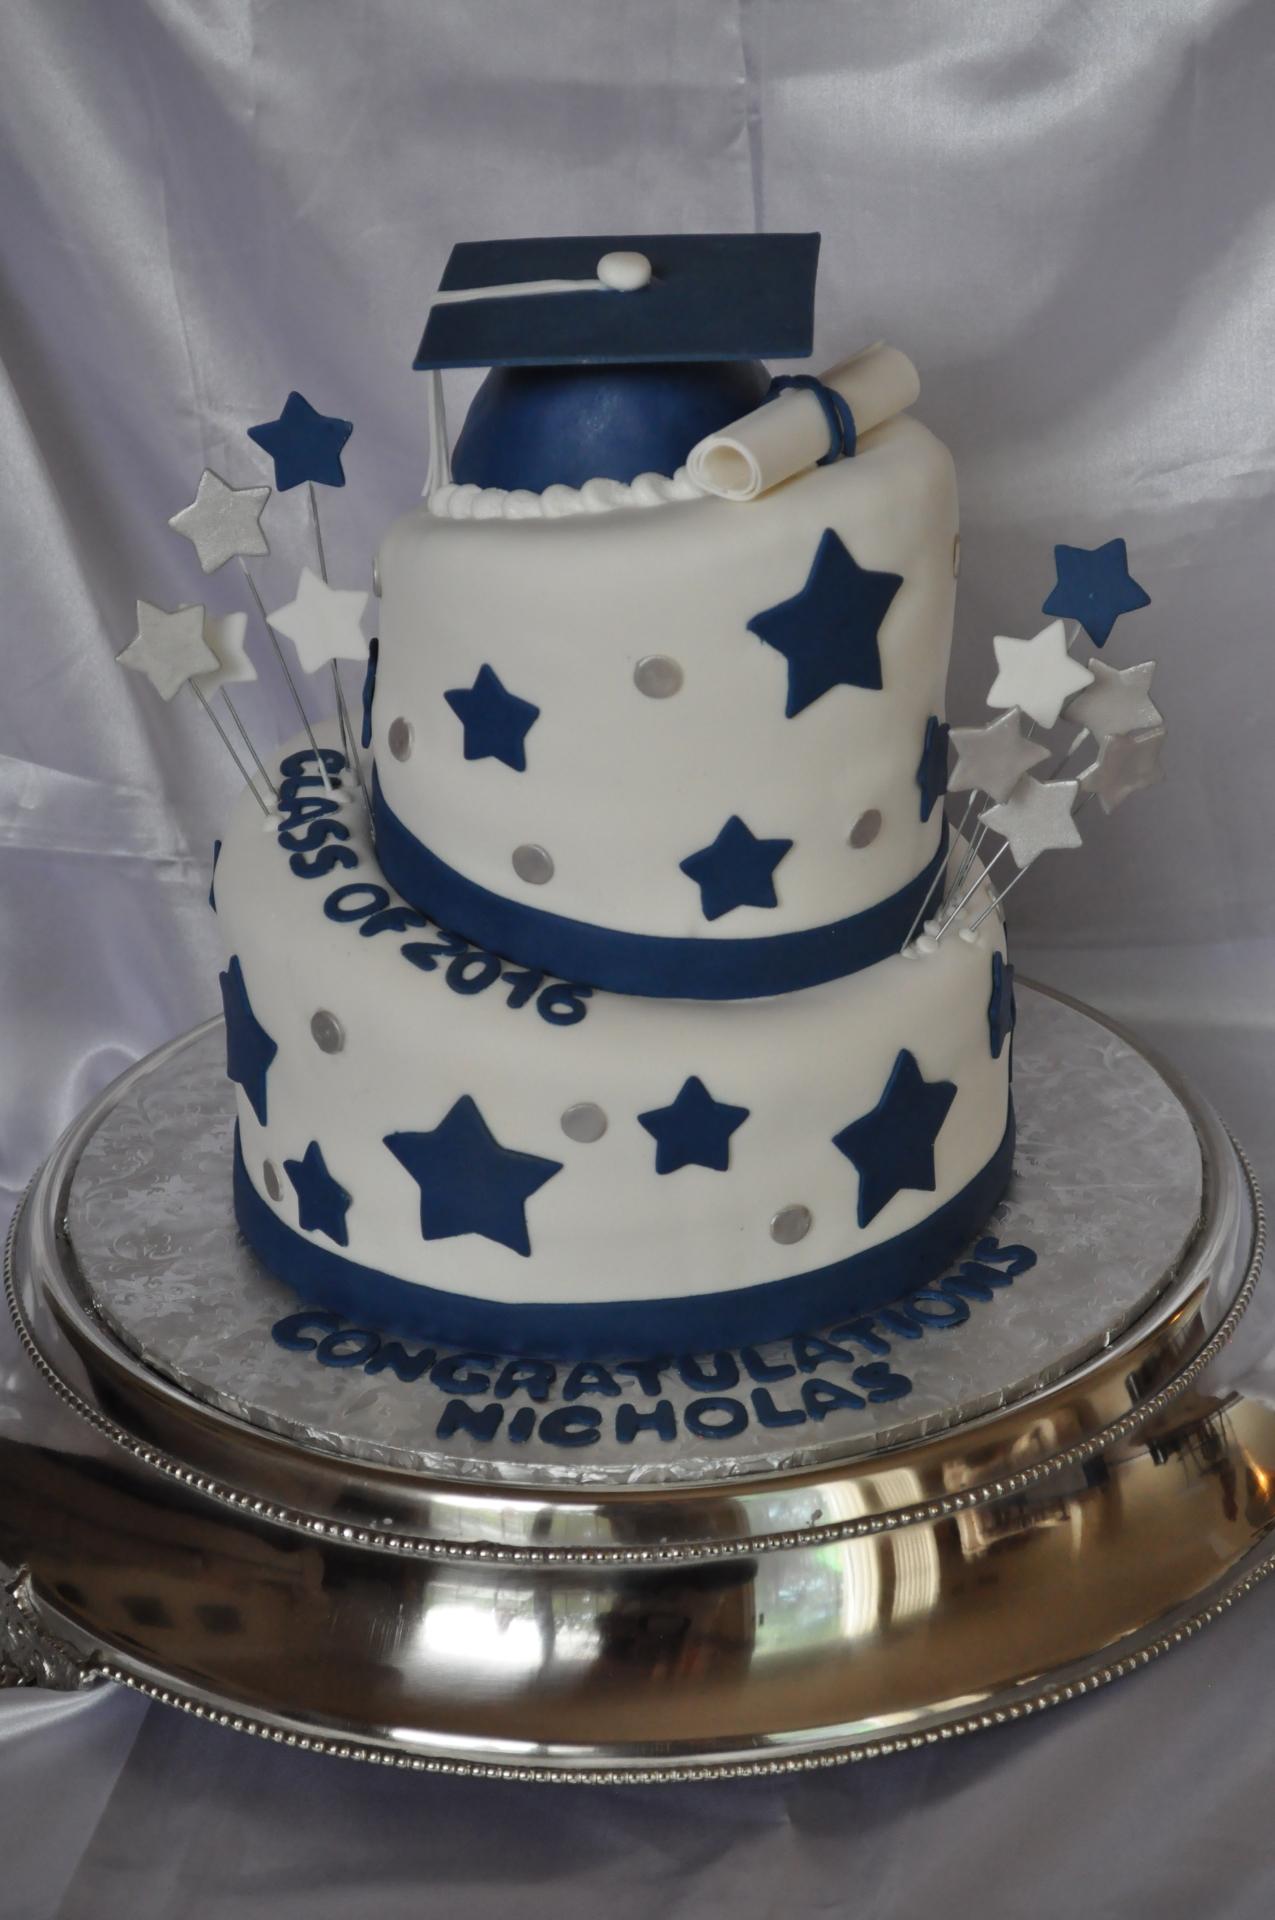 Graduation topsy turvy cake